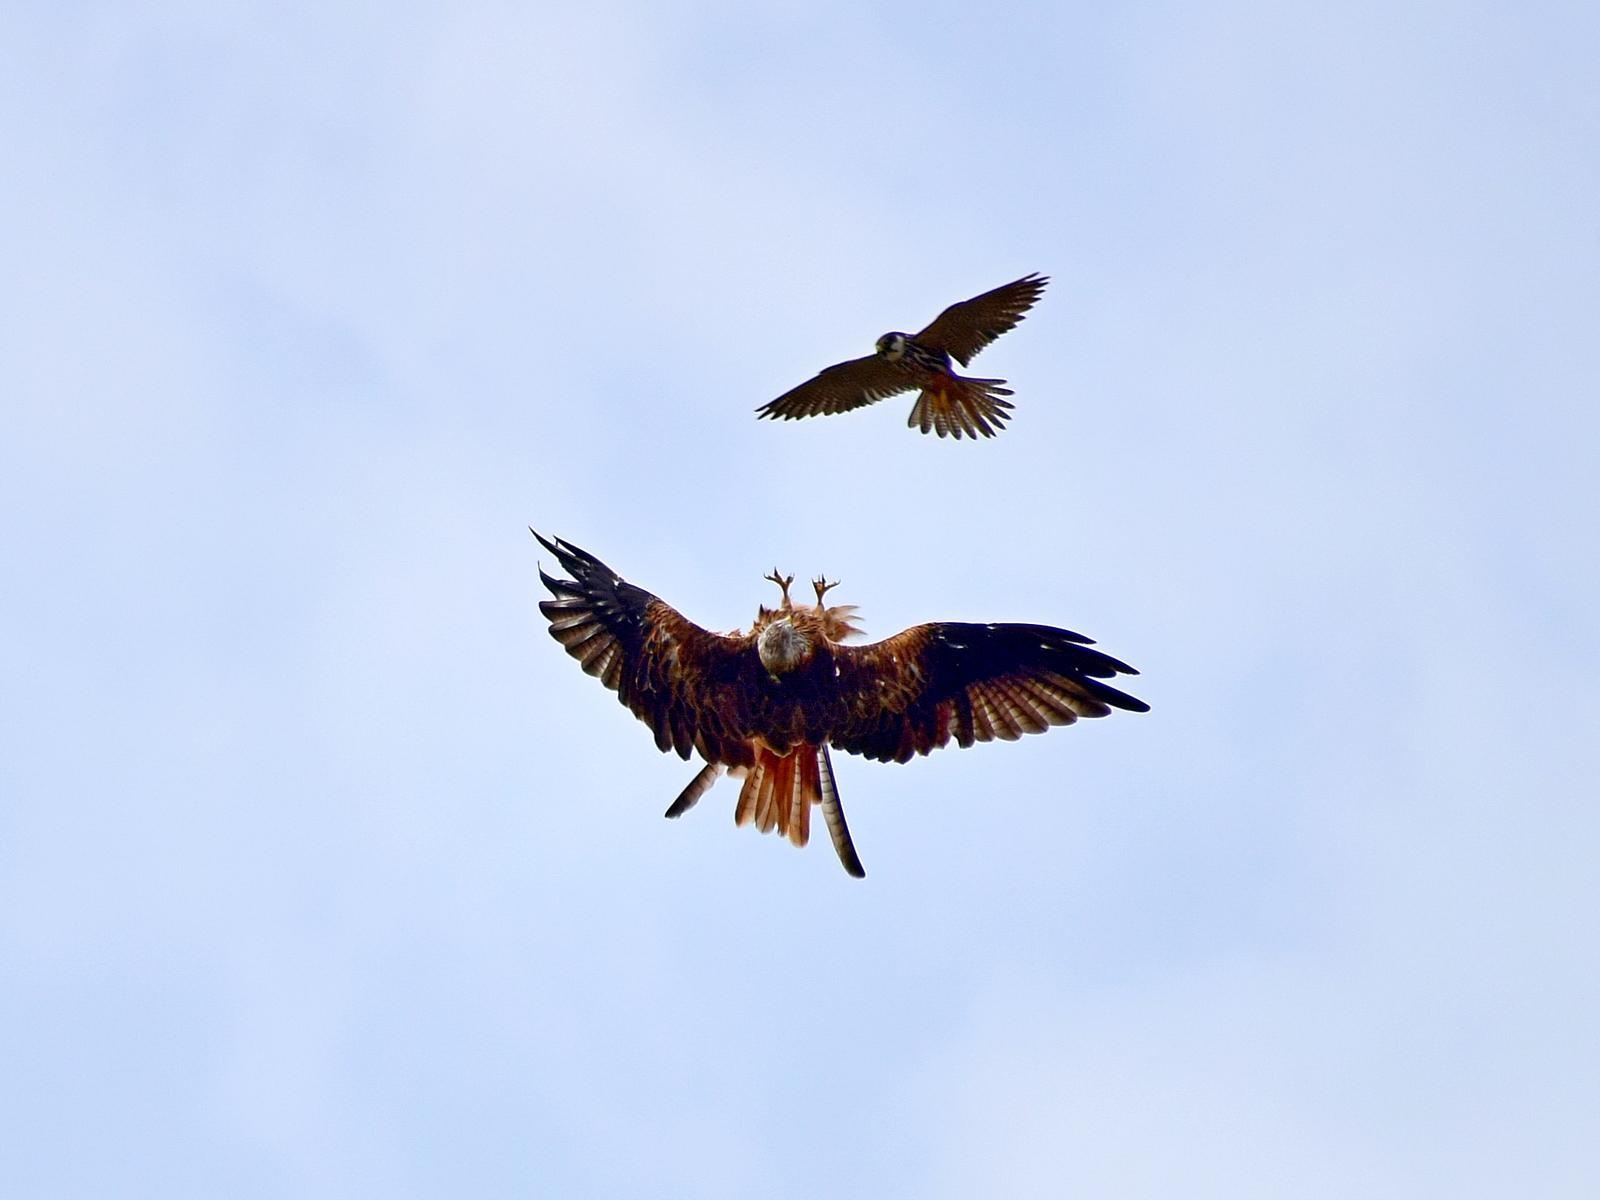 Red kite-hobby disagreement